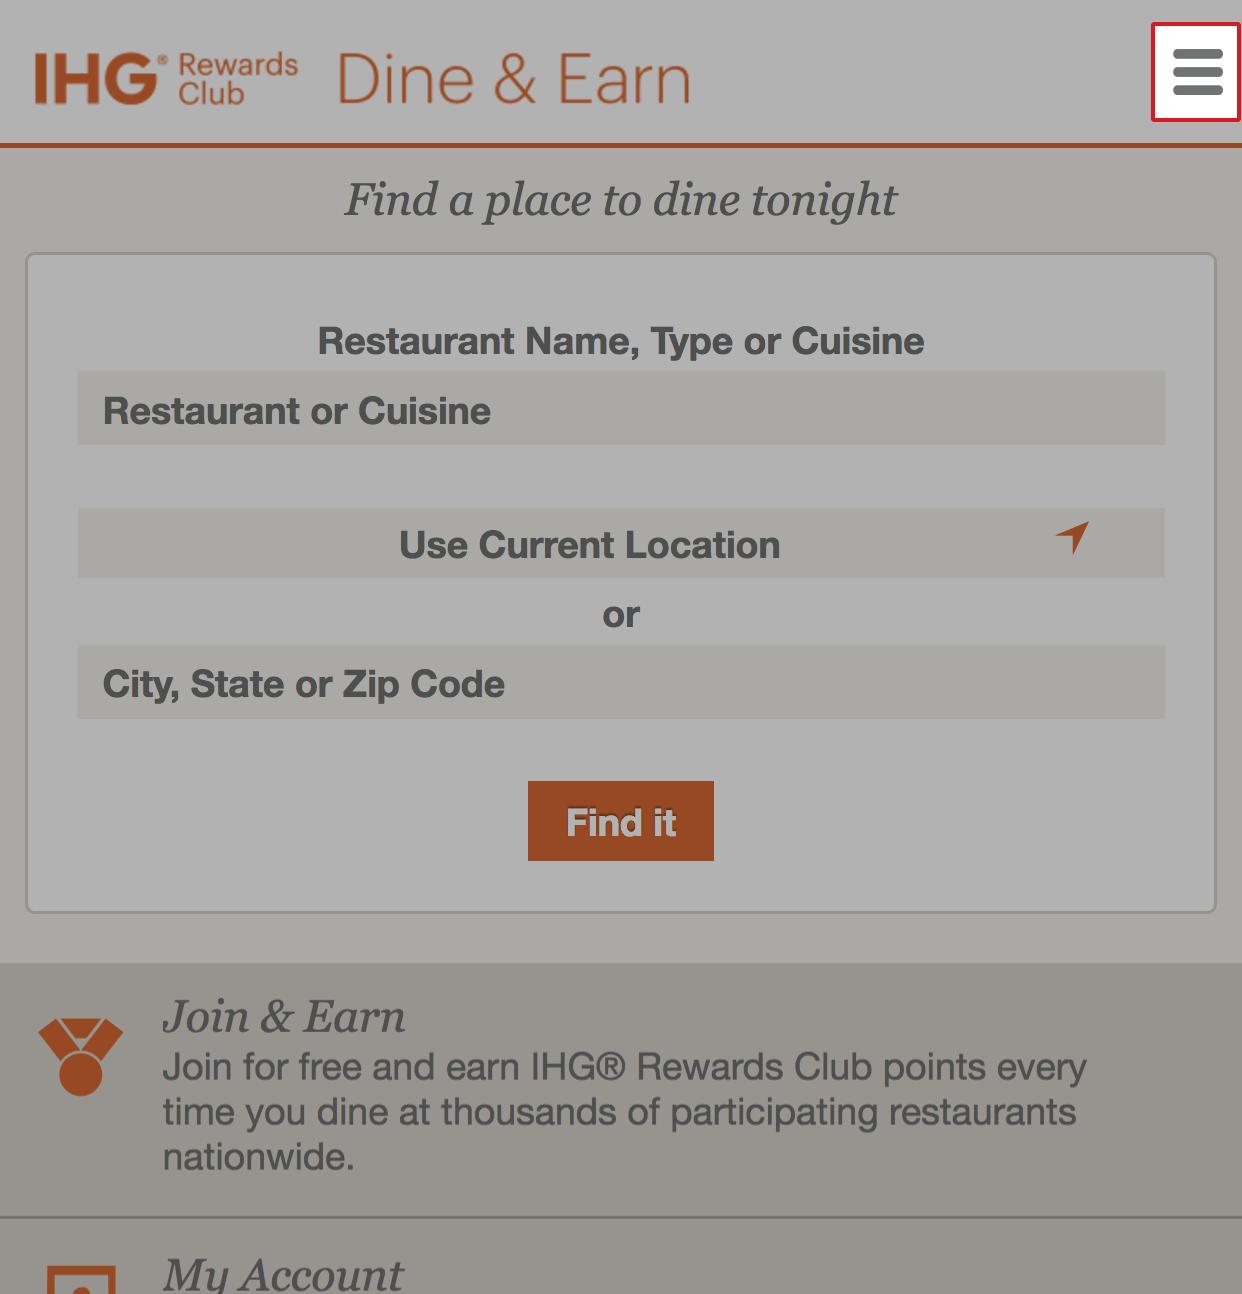 My account is locked  – IHG Rewards Club Dining Help Center